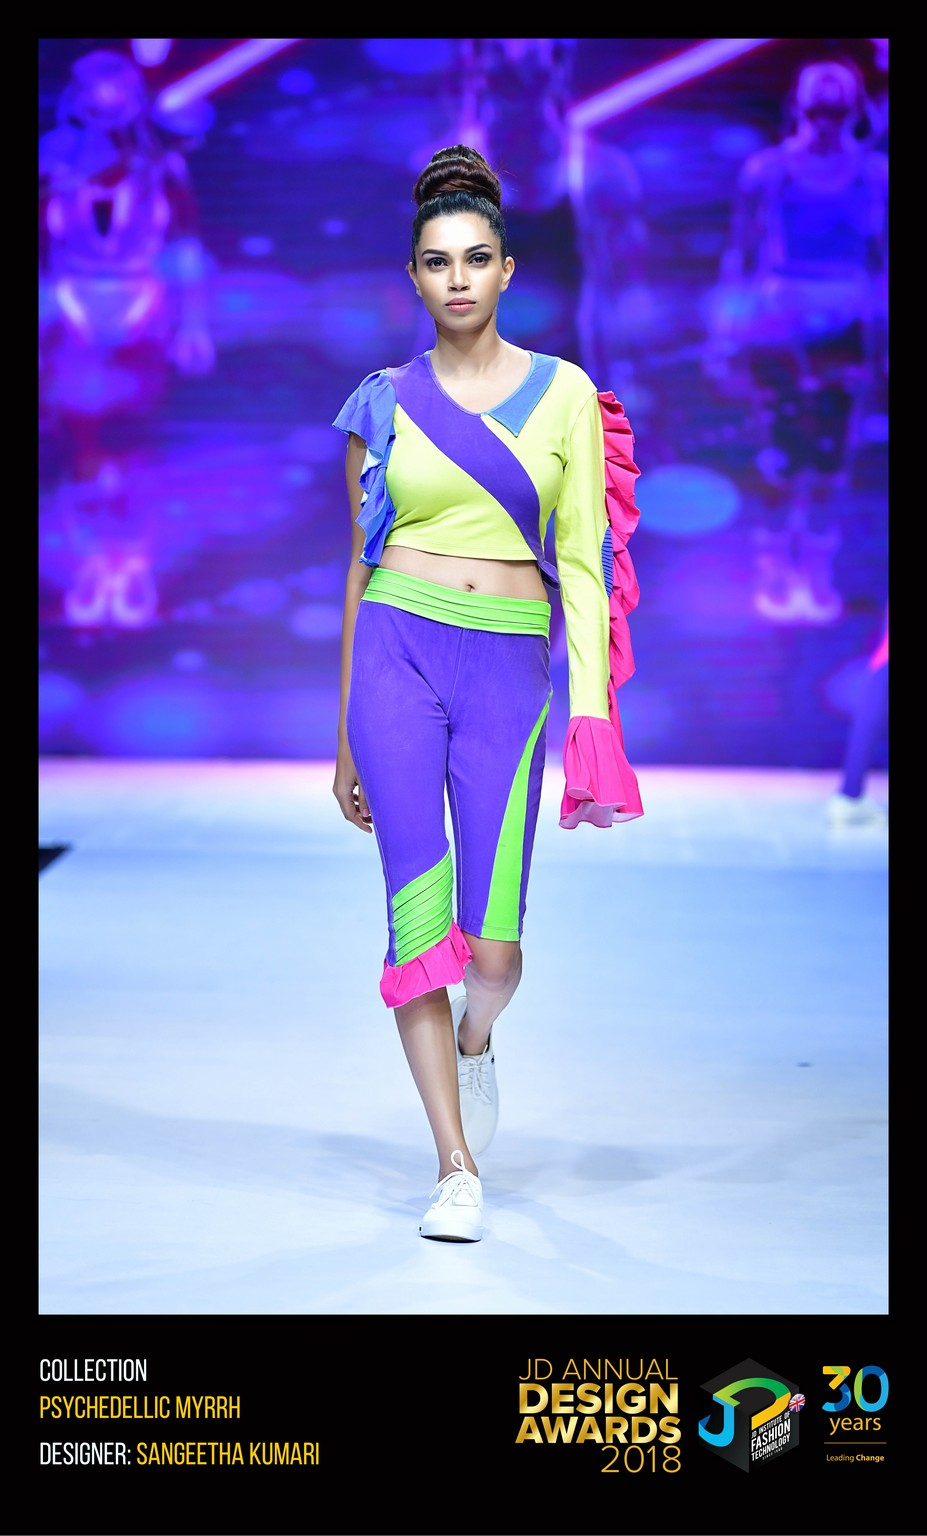 Psychedelic Myrrh – Change – JD Annual Design Awards 2018 | Designer: Sangeetha Kumari | Photography : Jerin Nath (@jerin_nath) psychedelic myrrh - PSYCHEDELLIC MYRRH9 - Psychedelic Myrrh – Change – JD Annual Design Awards 2018